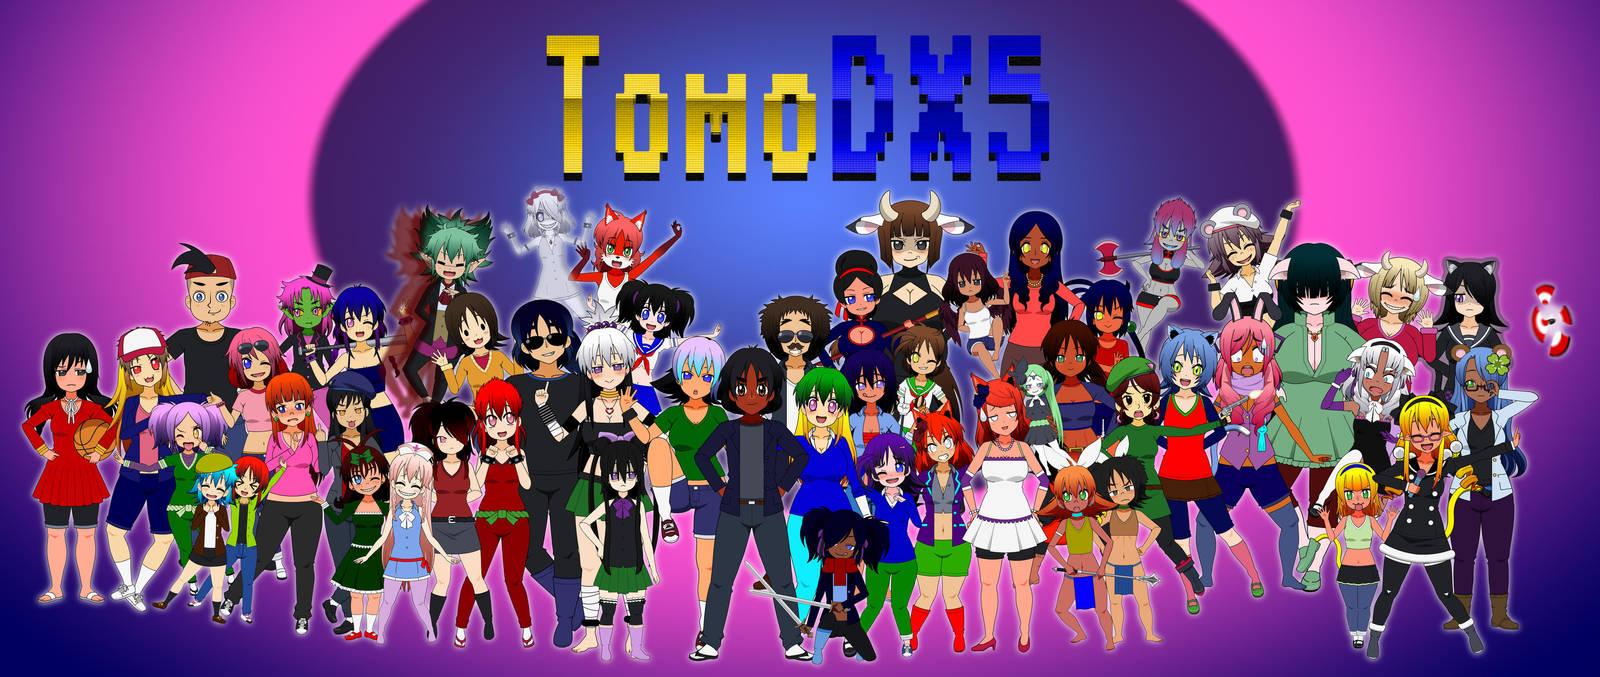 TomoDX5's Profile Picture